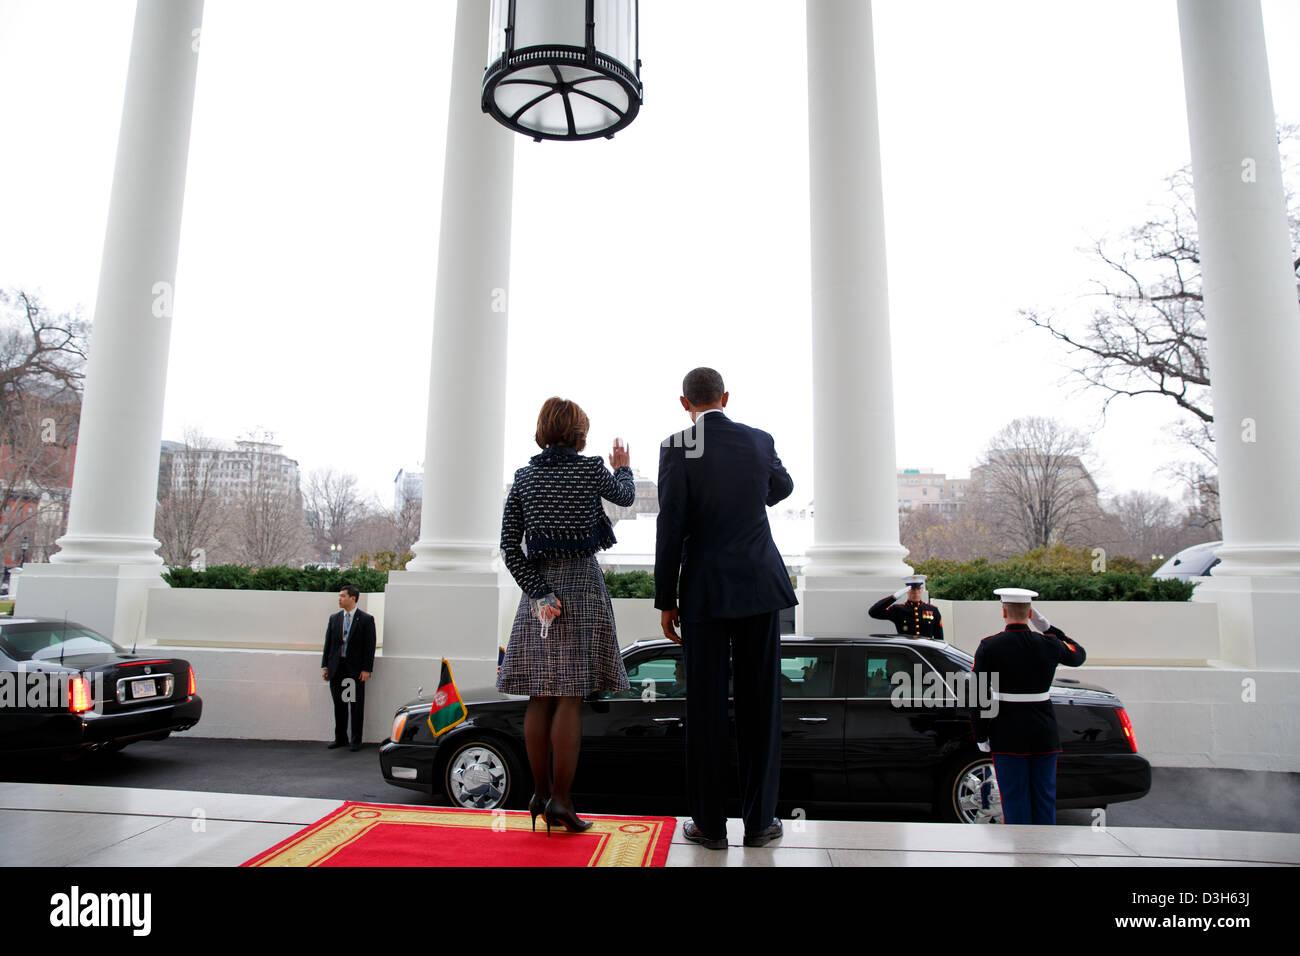 US President Barack Obama and Ambassador Capricia Marshall, Chief of Protocol, wave to President Hamid Karzai of - Stock Image